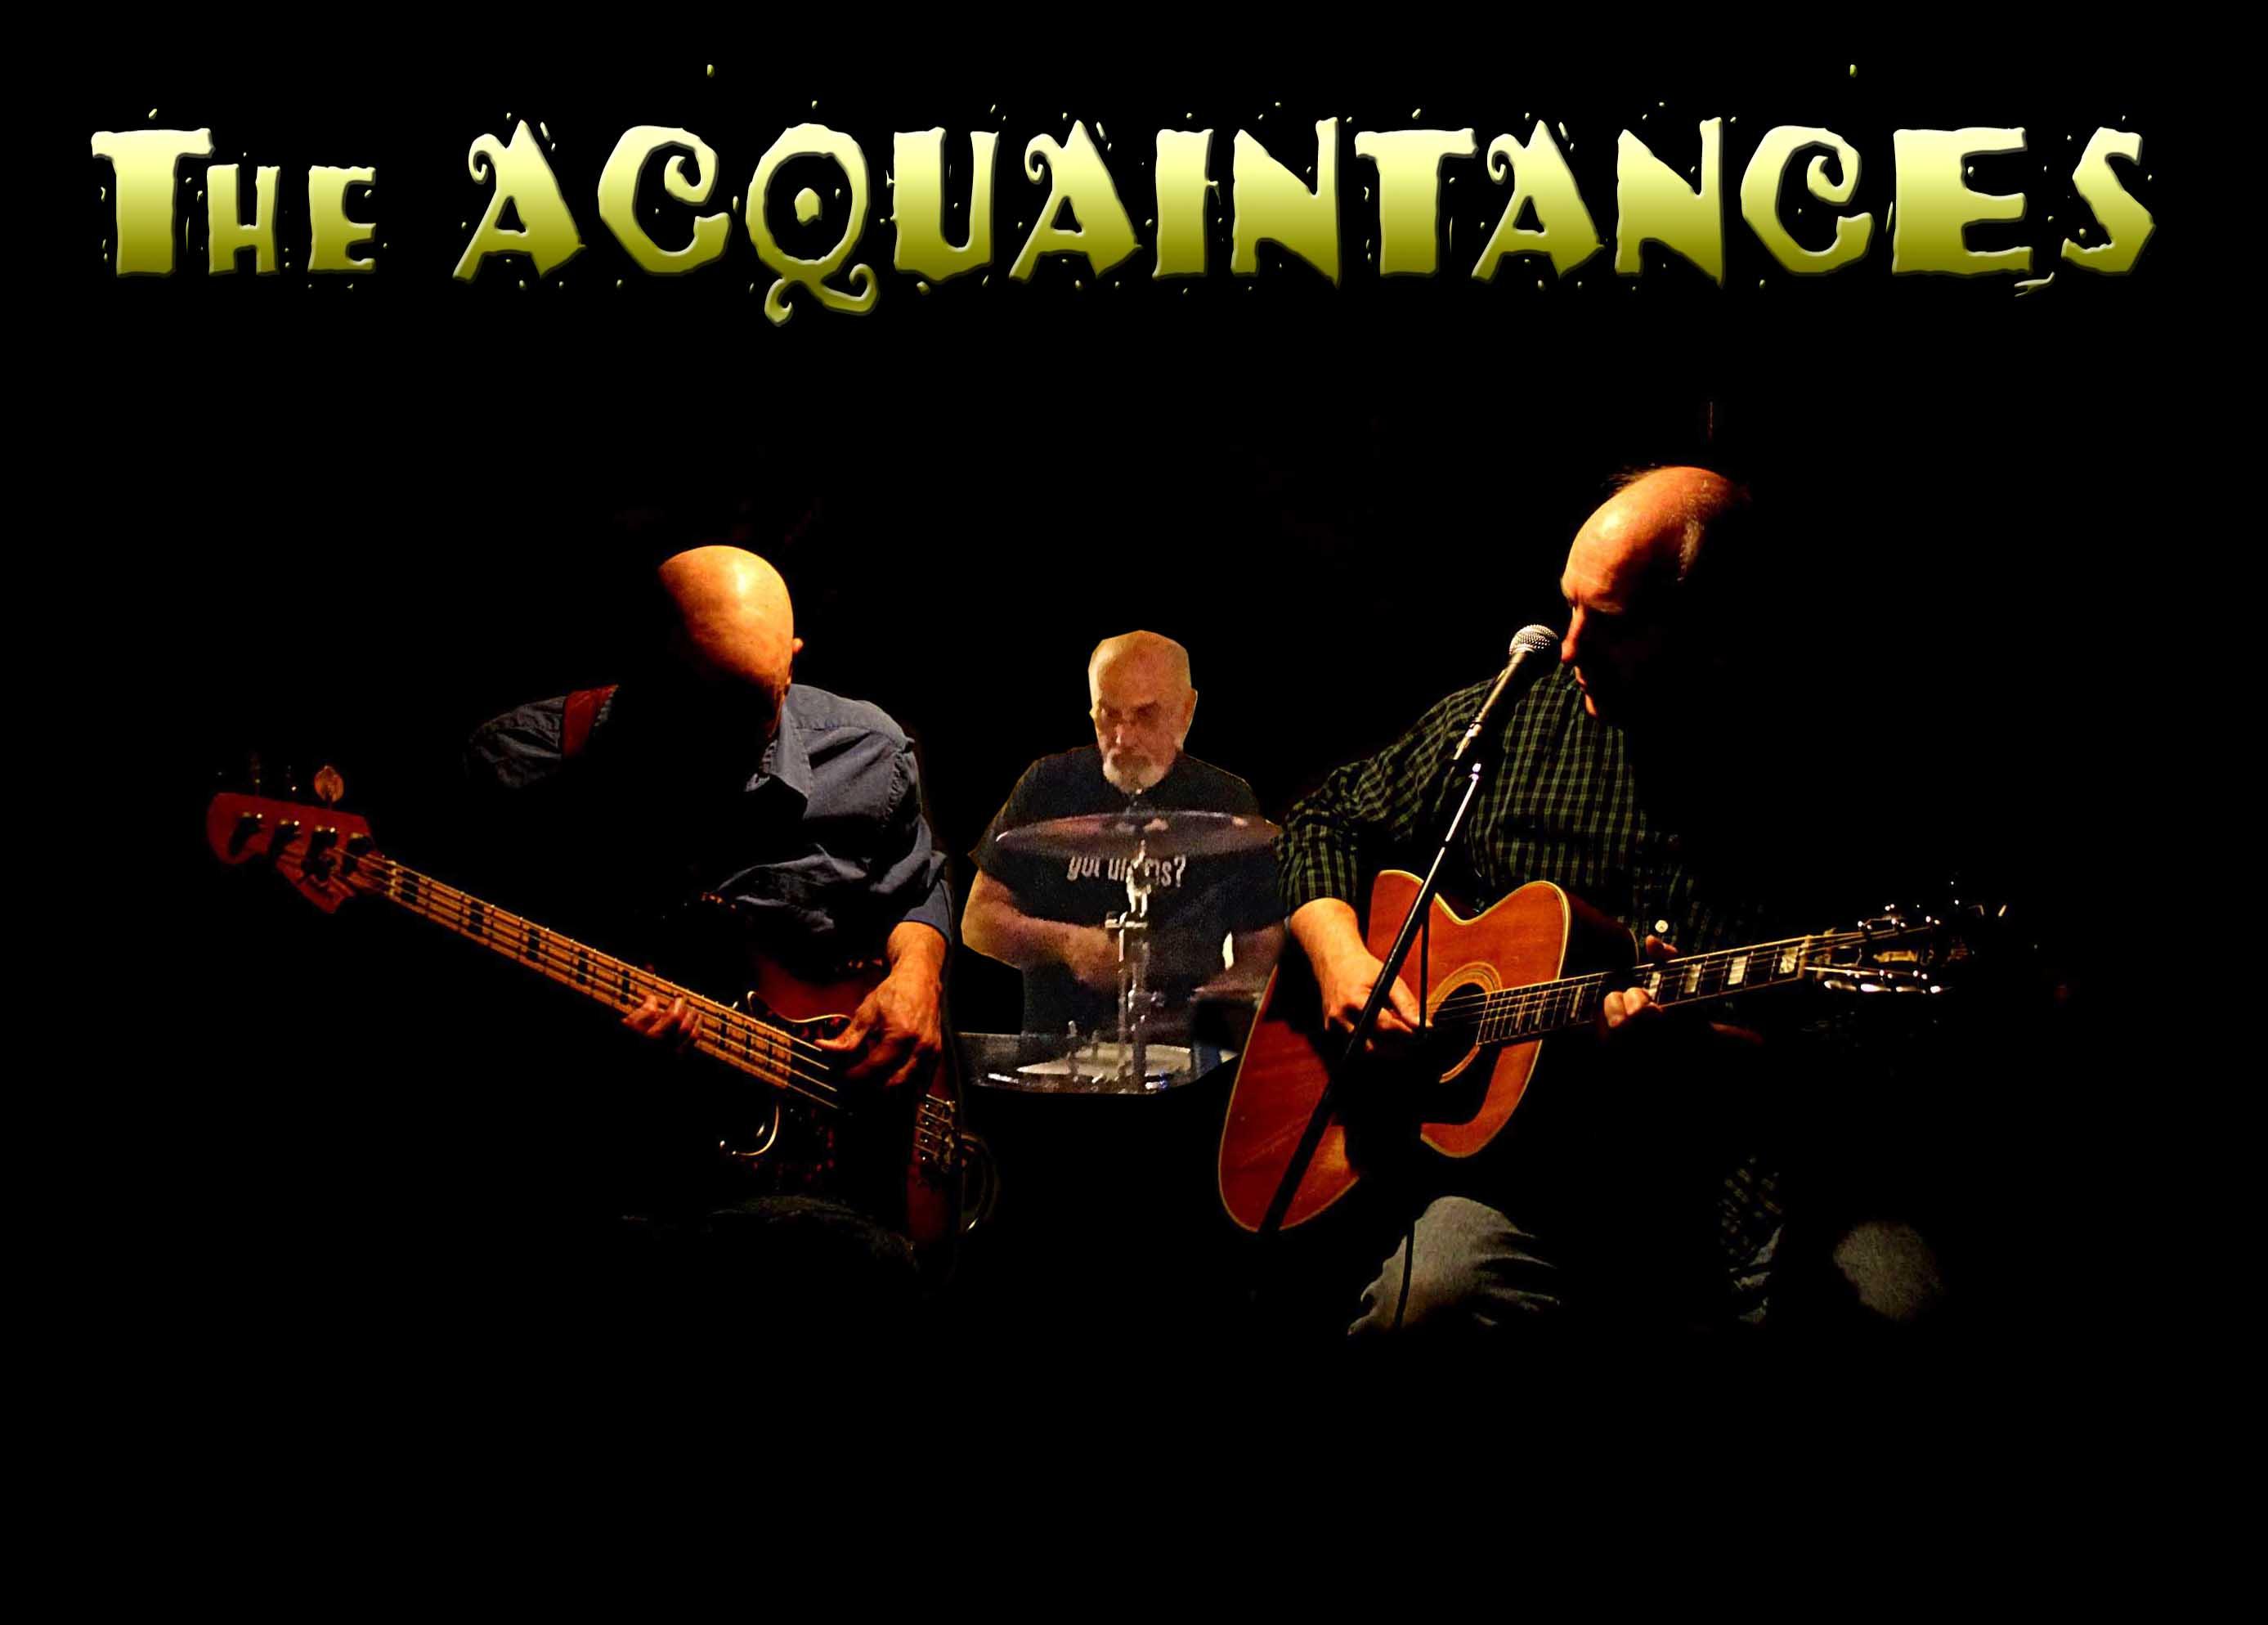 The-Acquaintances-header.JPG